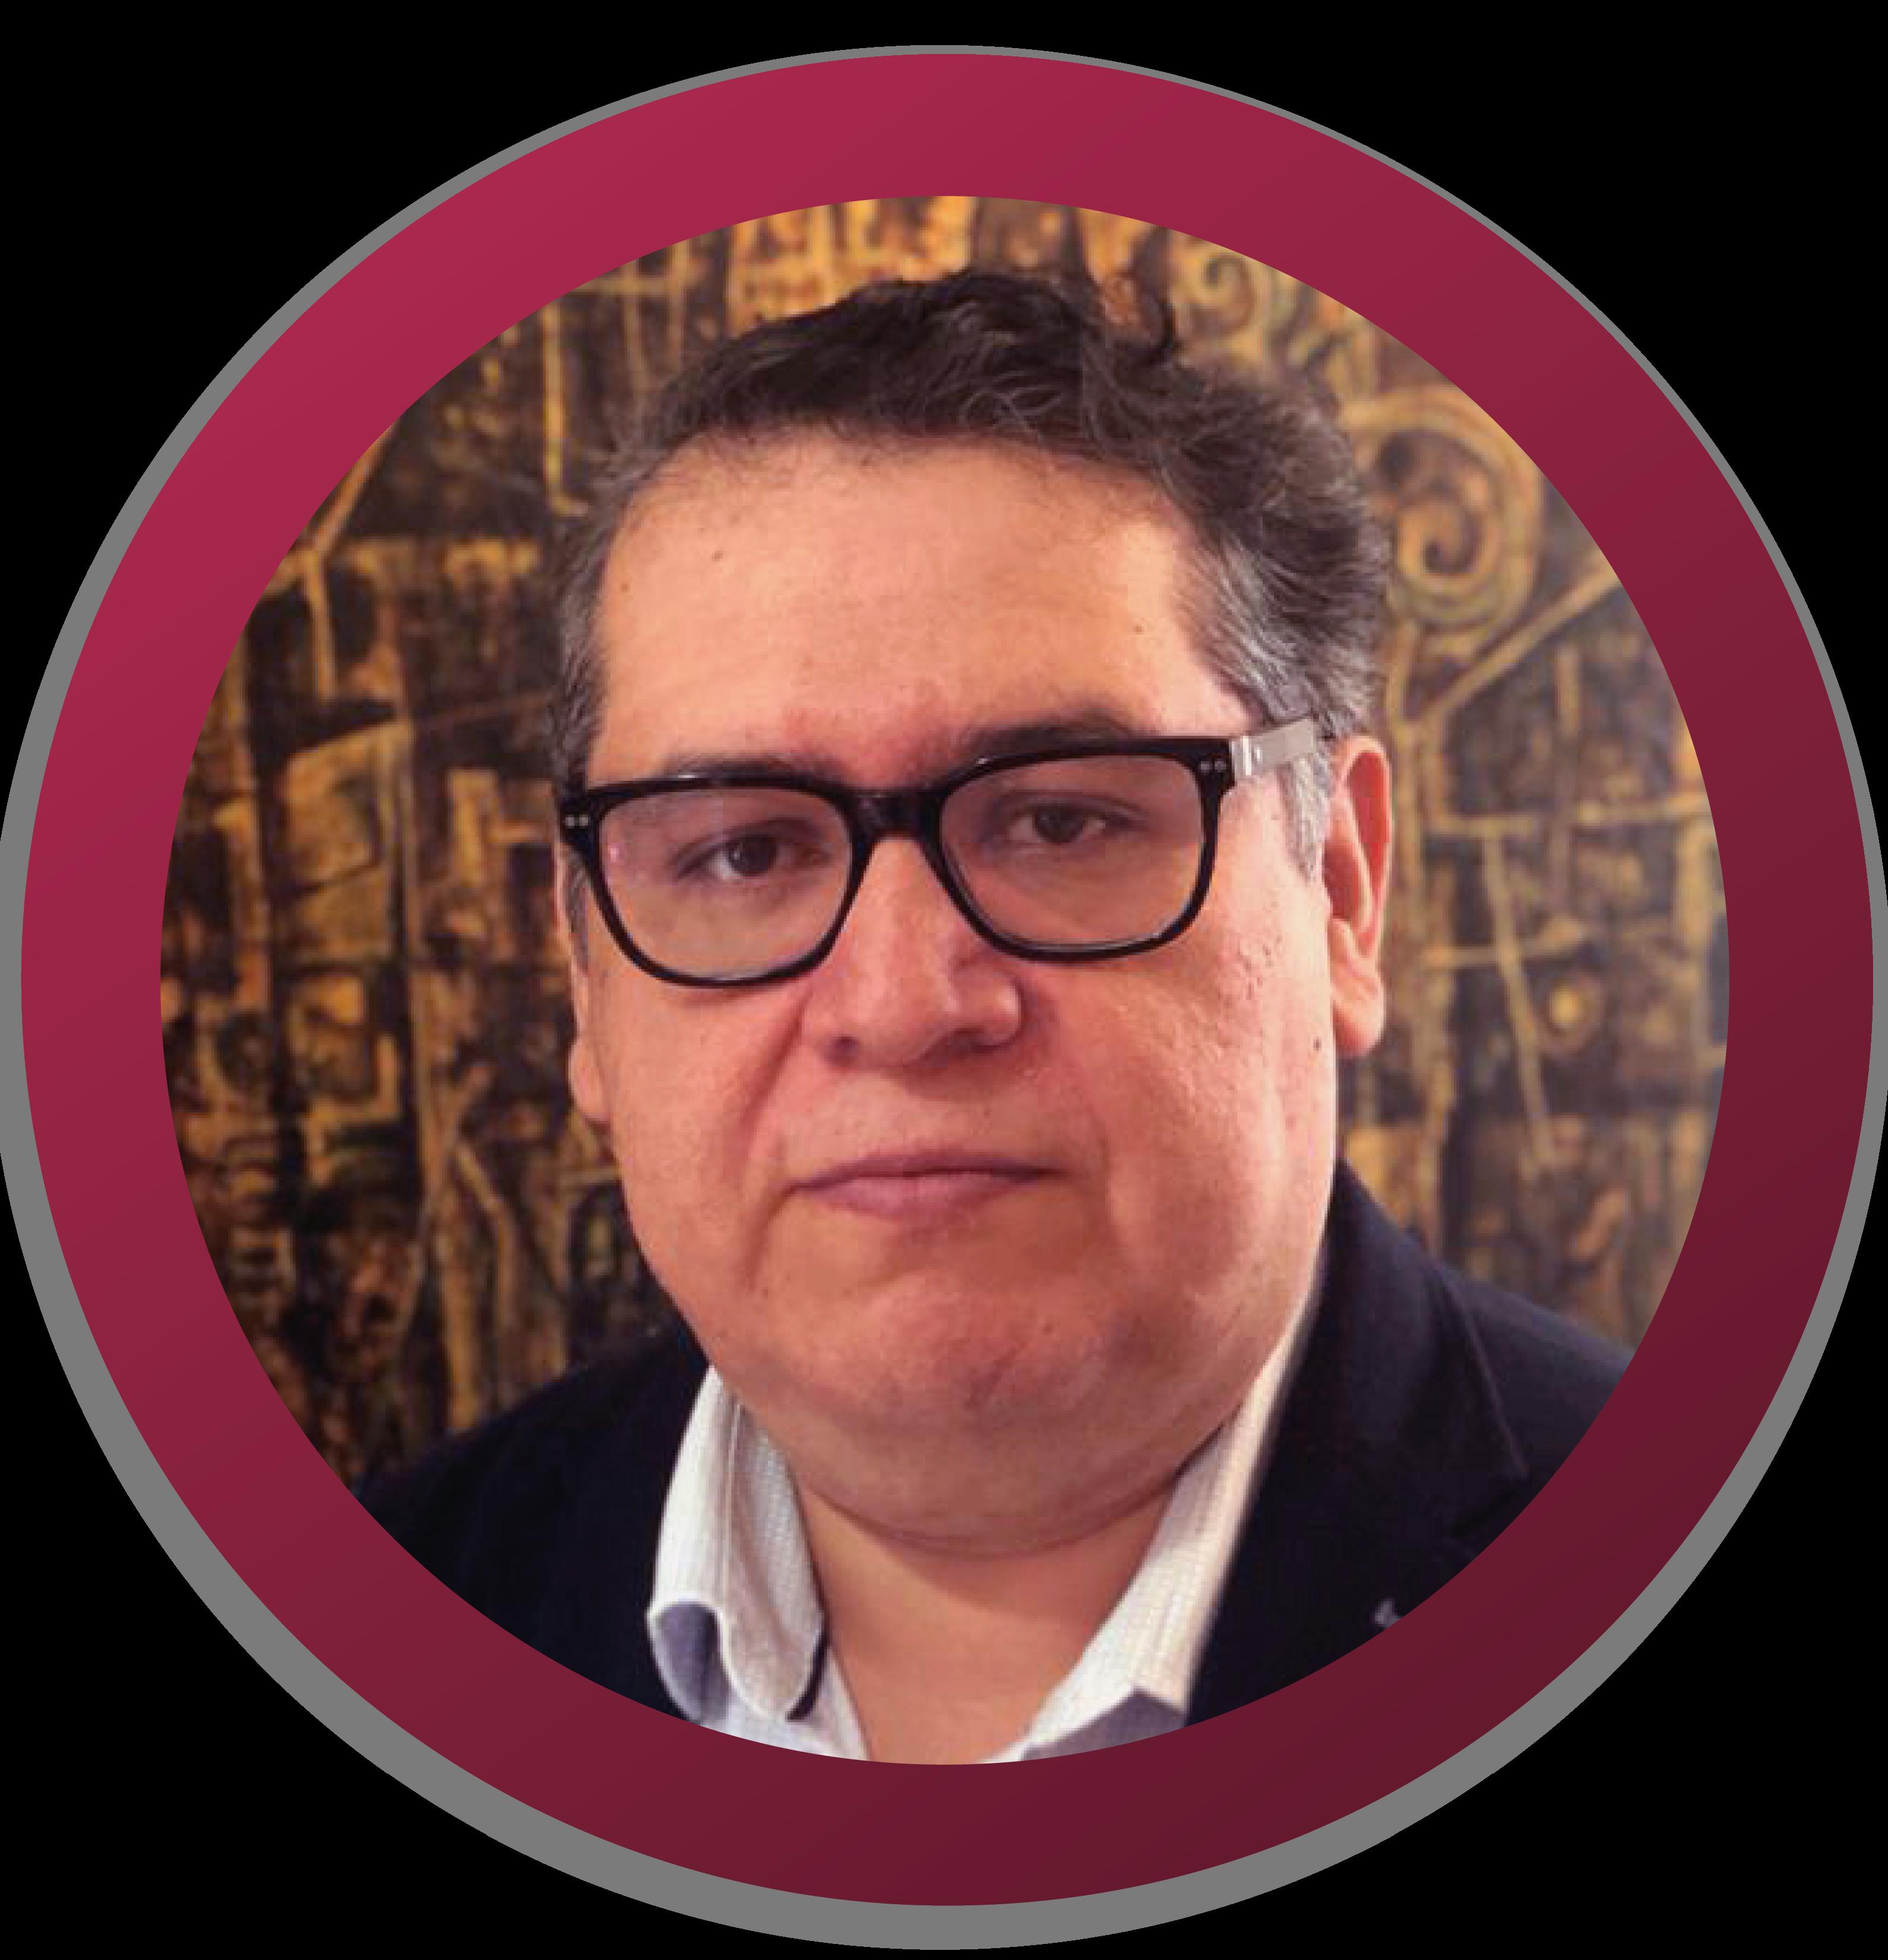 Rafael Guzmán Torres